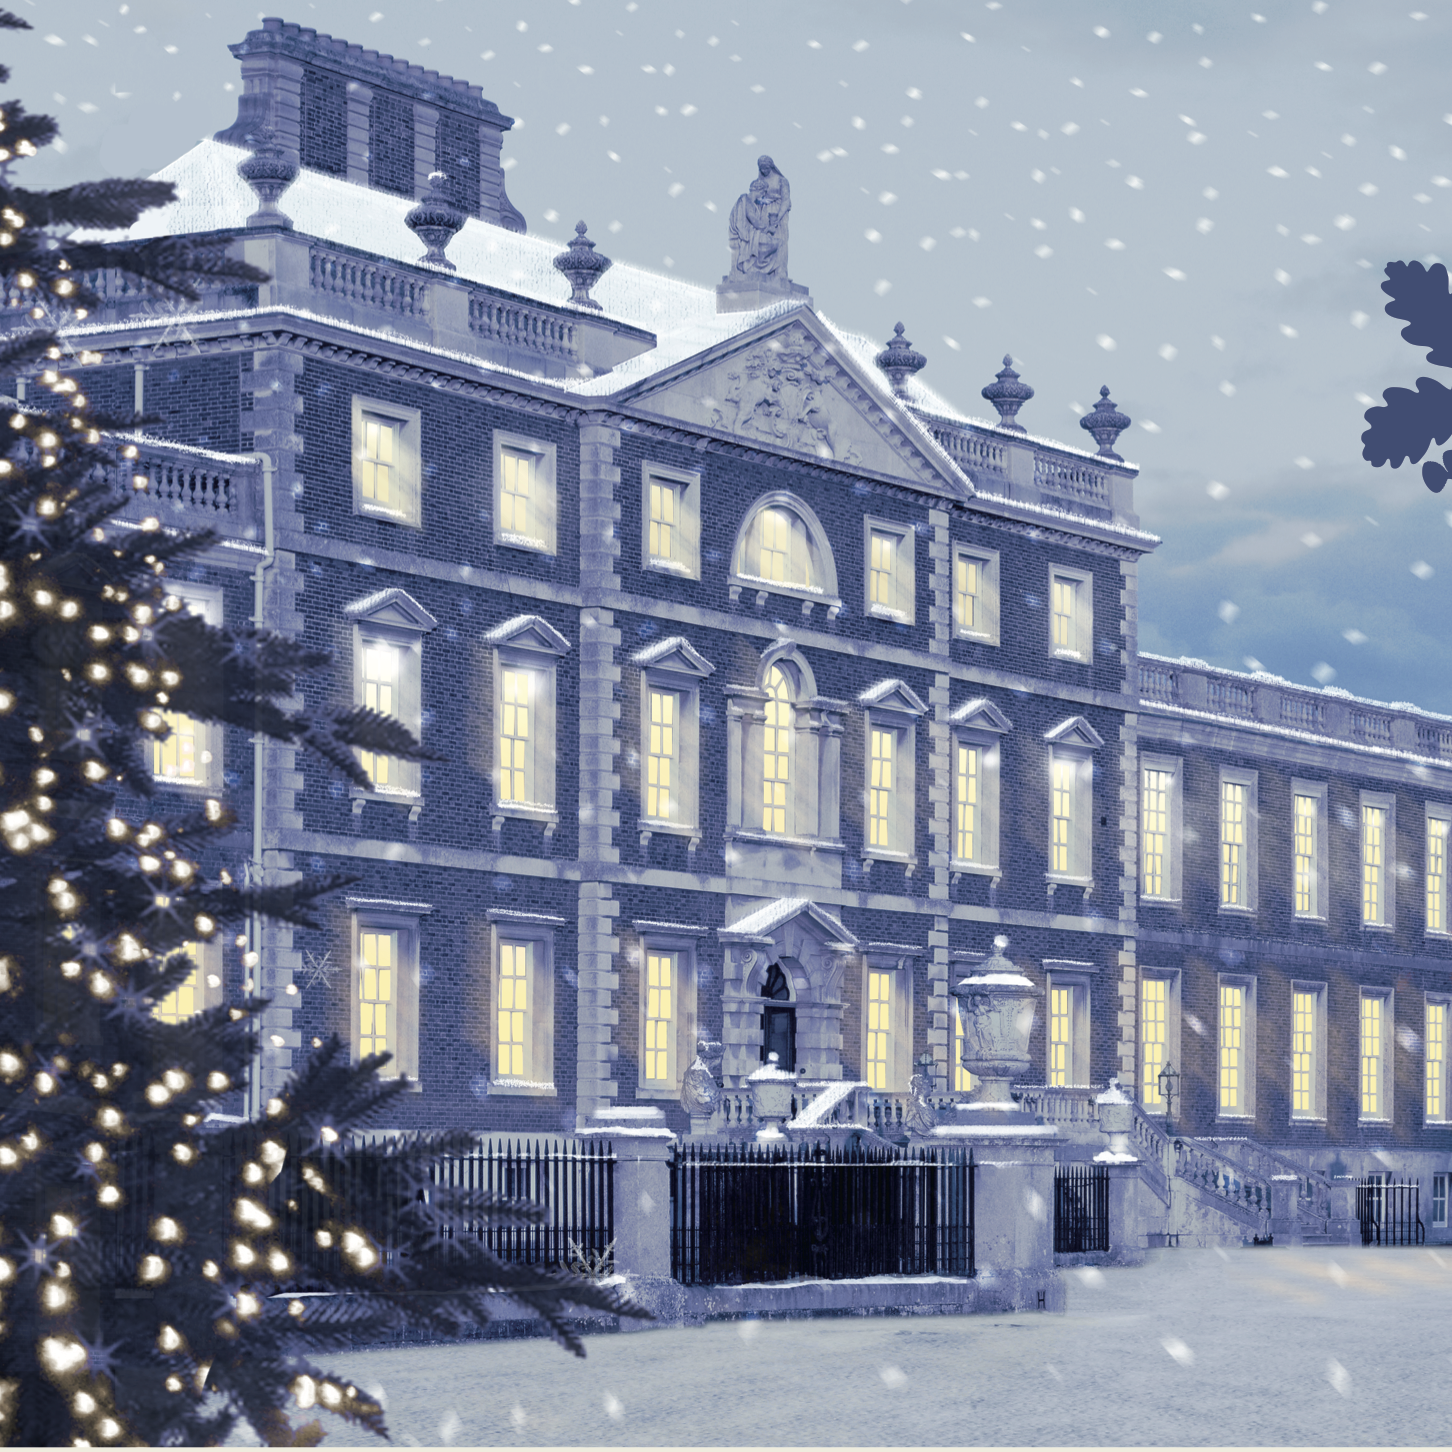 Wimpole Hall Christmas